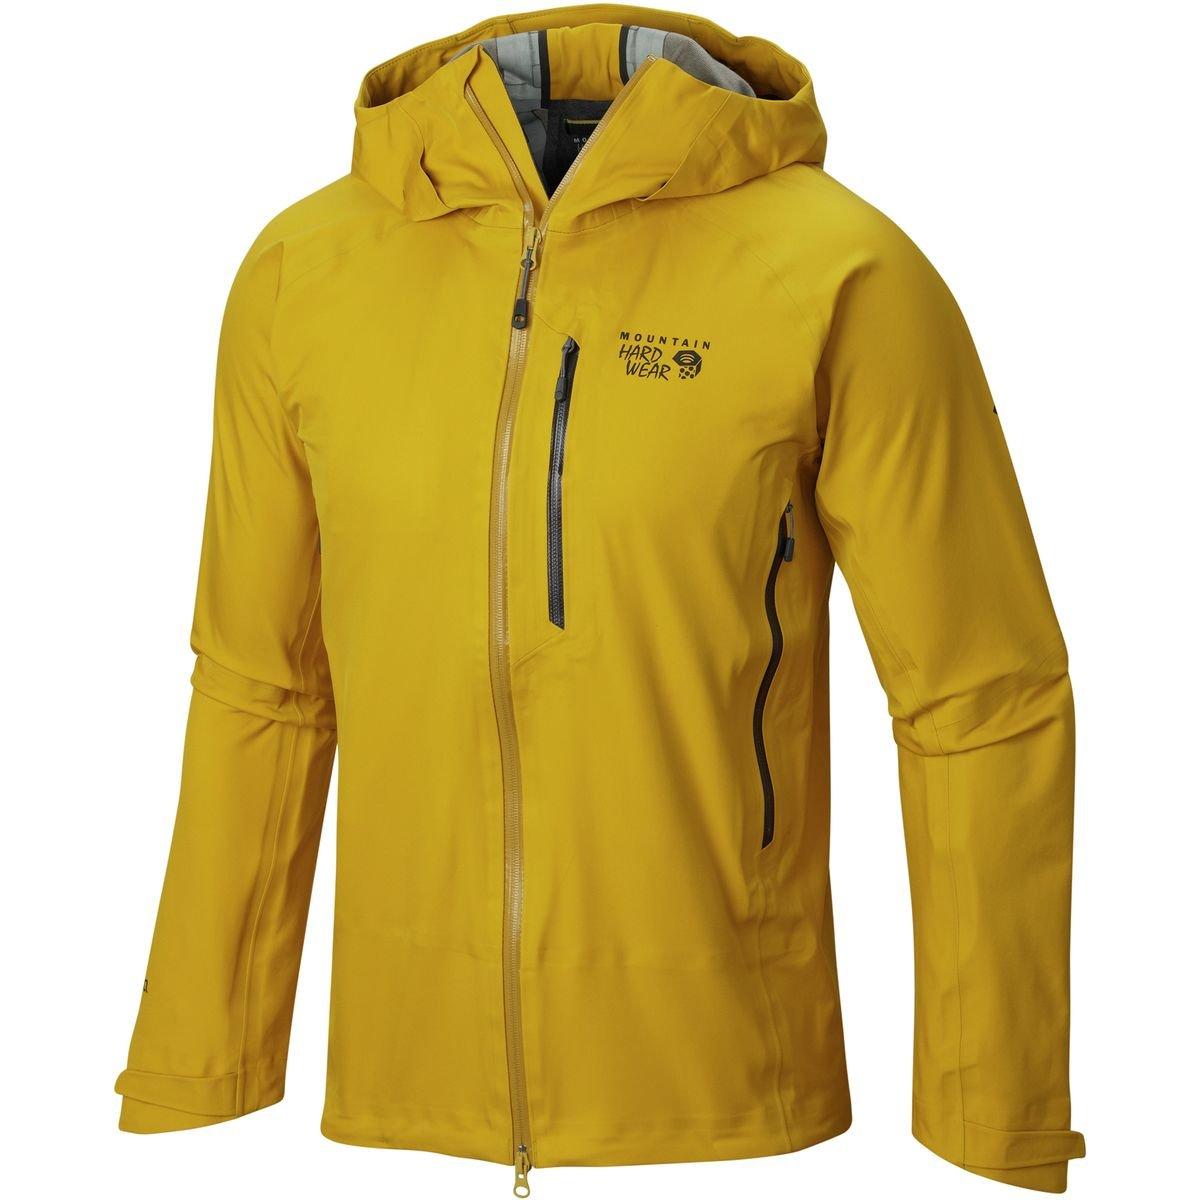 a6245118815 outlet Mountain Hardwear Alchemy Hooded Jacket - Men s - asisc.ir